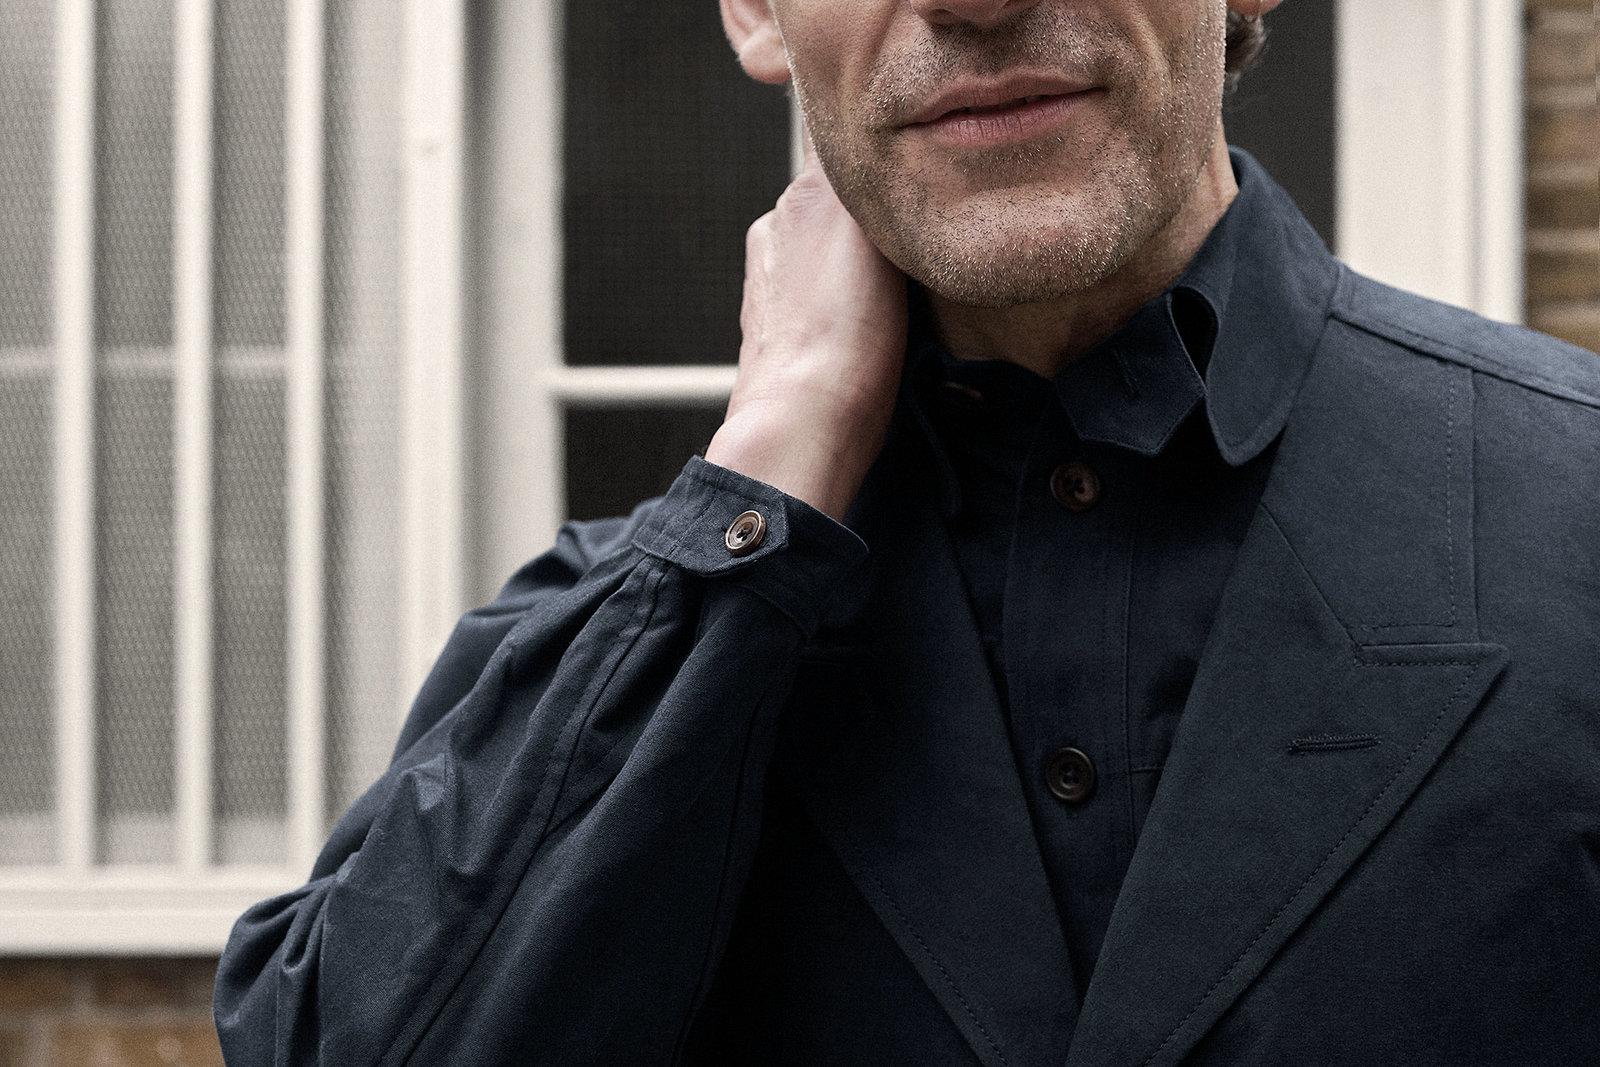 waistcoat-canopy-cotton-navy-worn-3@2x.jpg